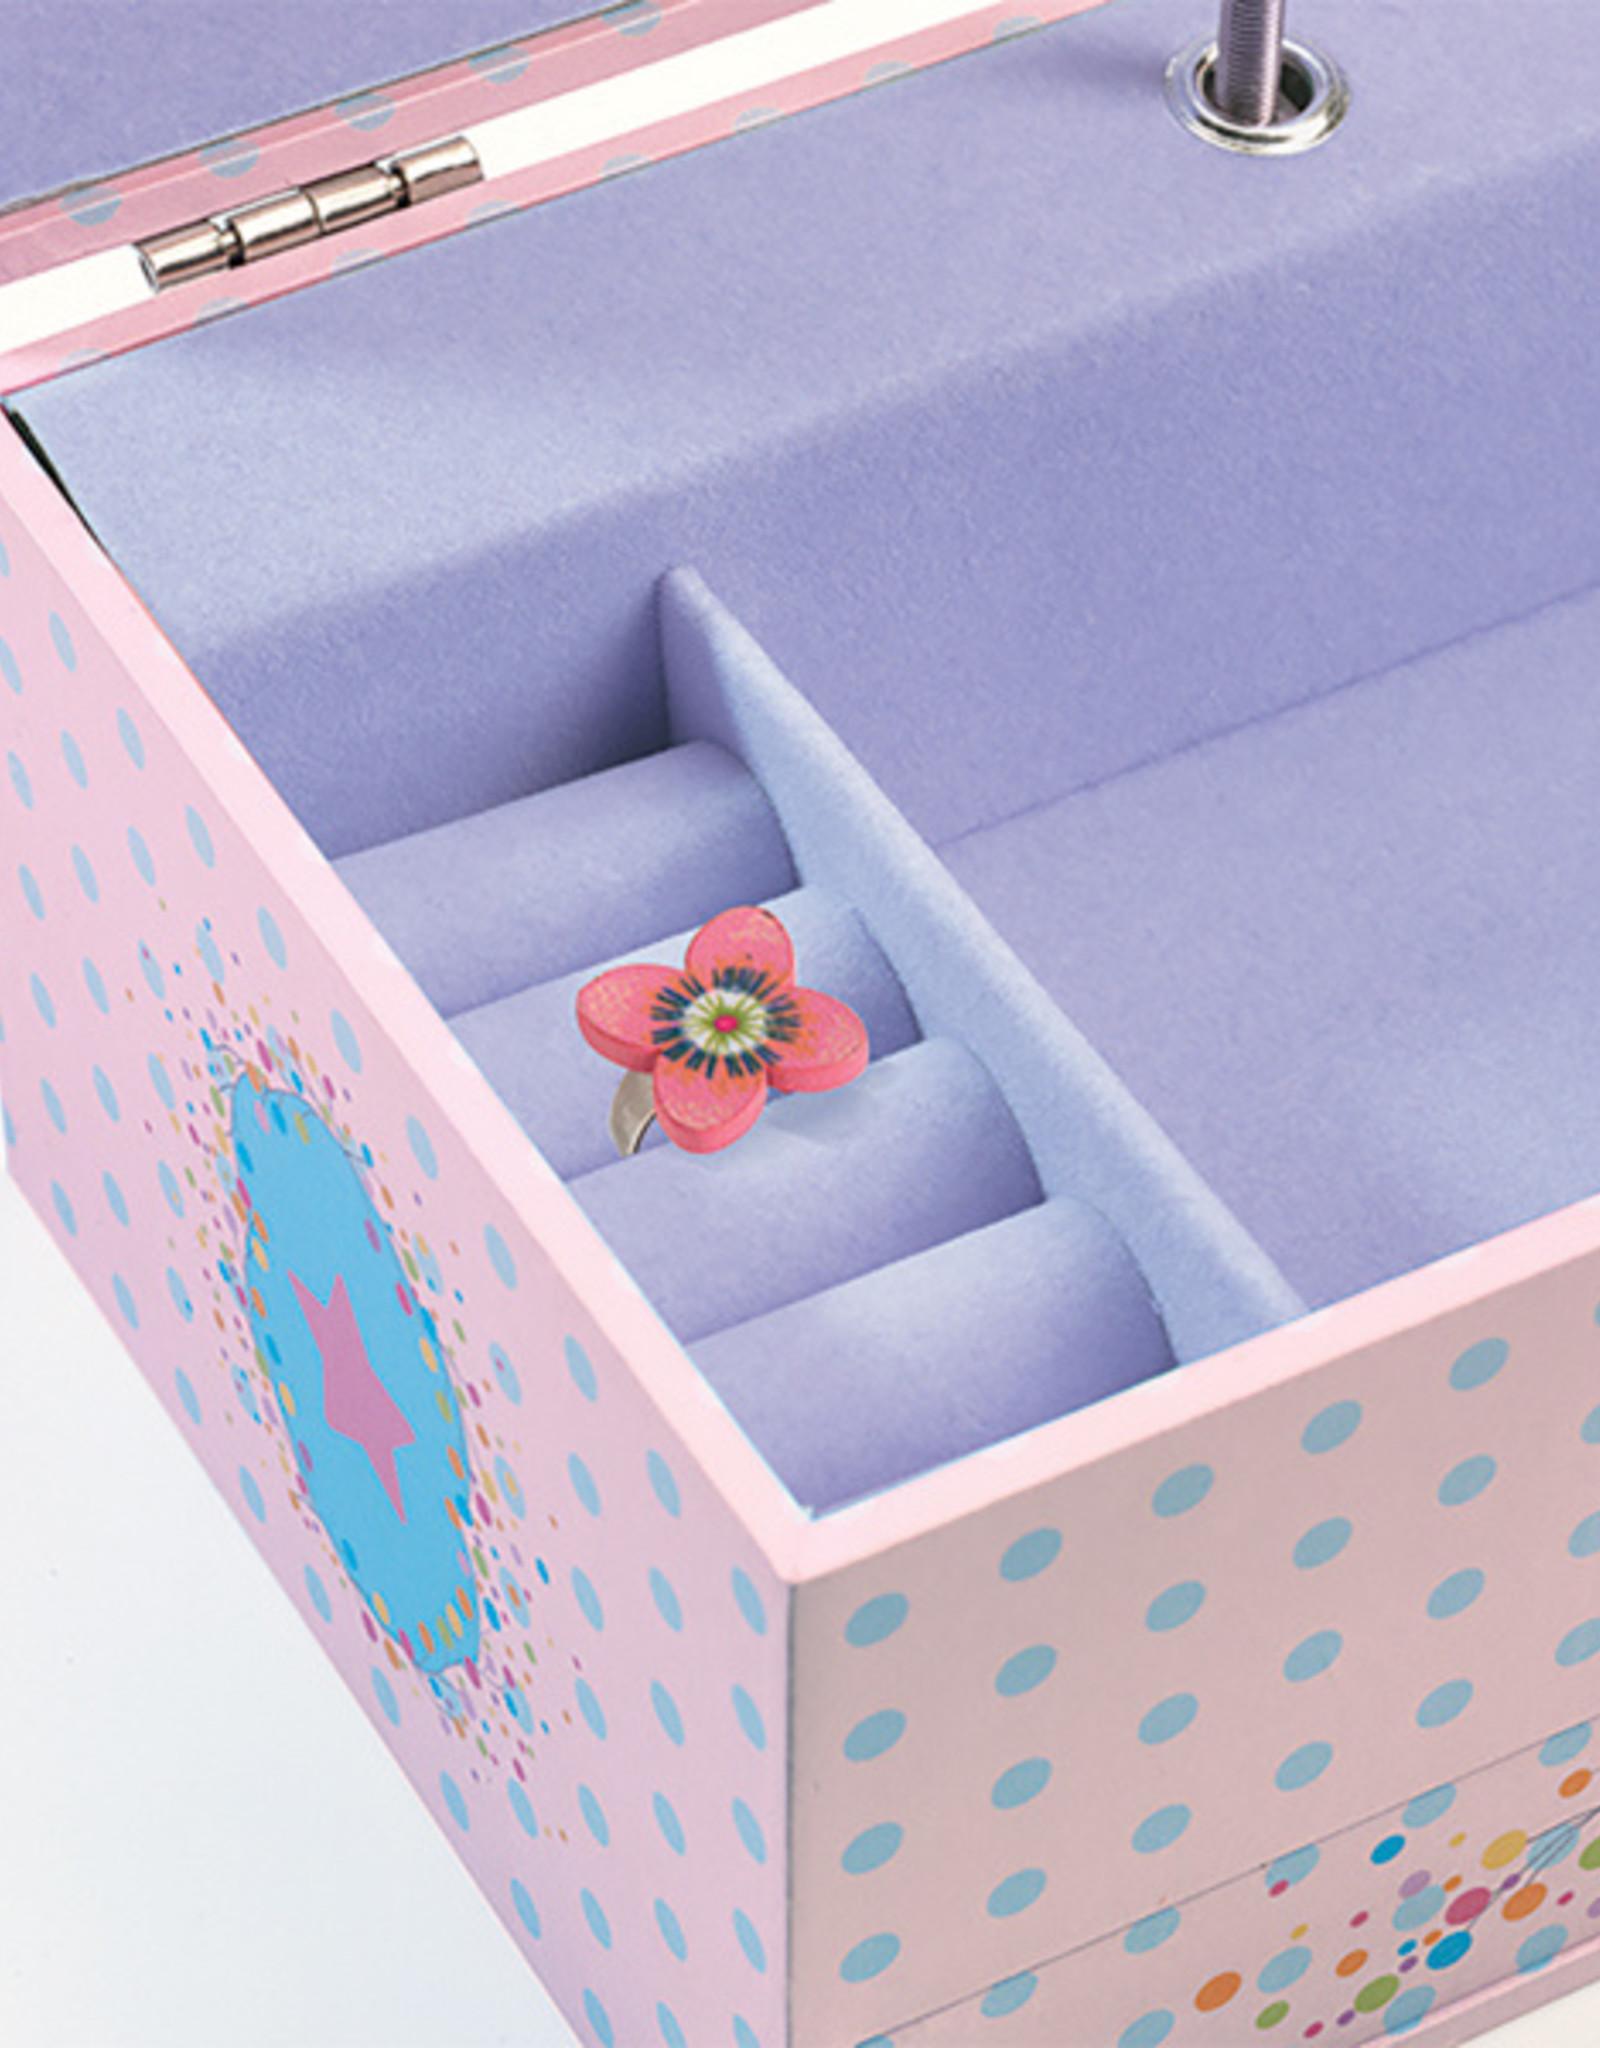 Djeco Djeco - The Ballerina's Tune Music Box